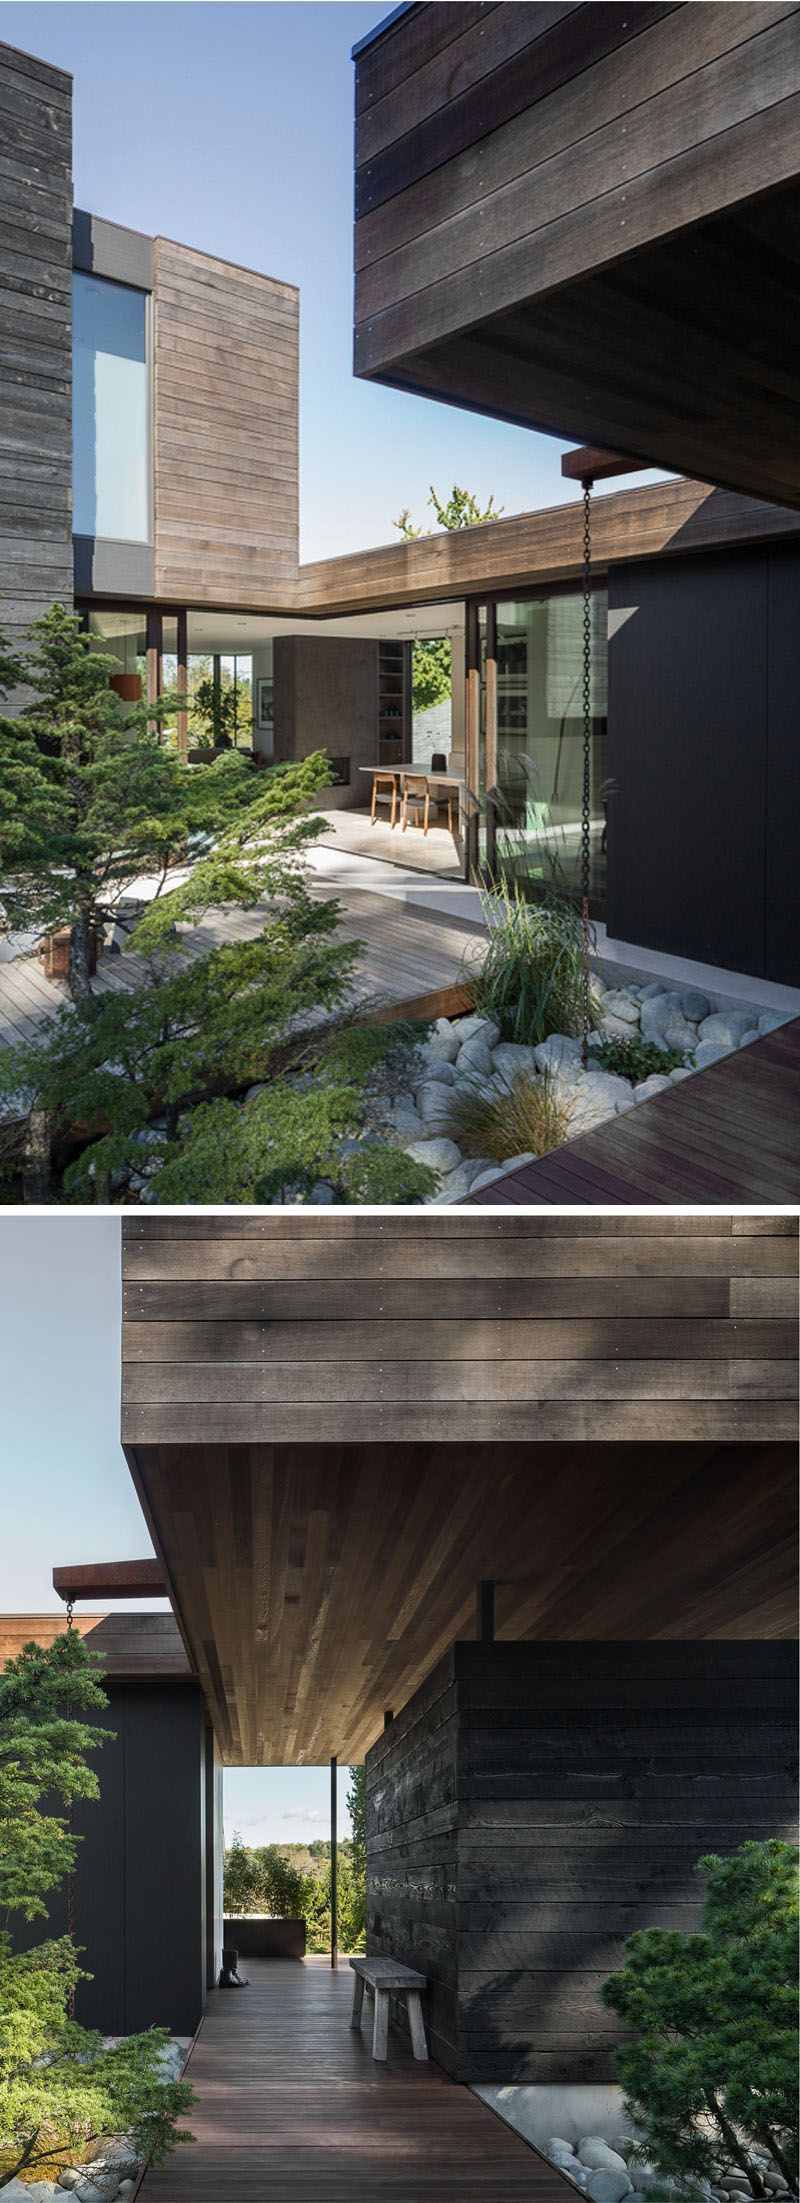 Modernes Haus | Hausbau Ideen - verschiedene Haustypen | Pinterest ...